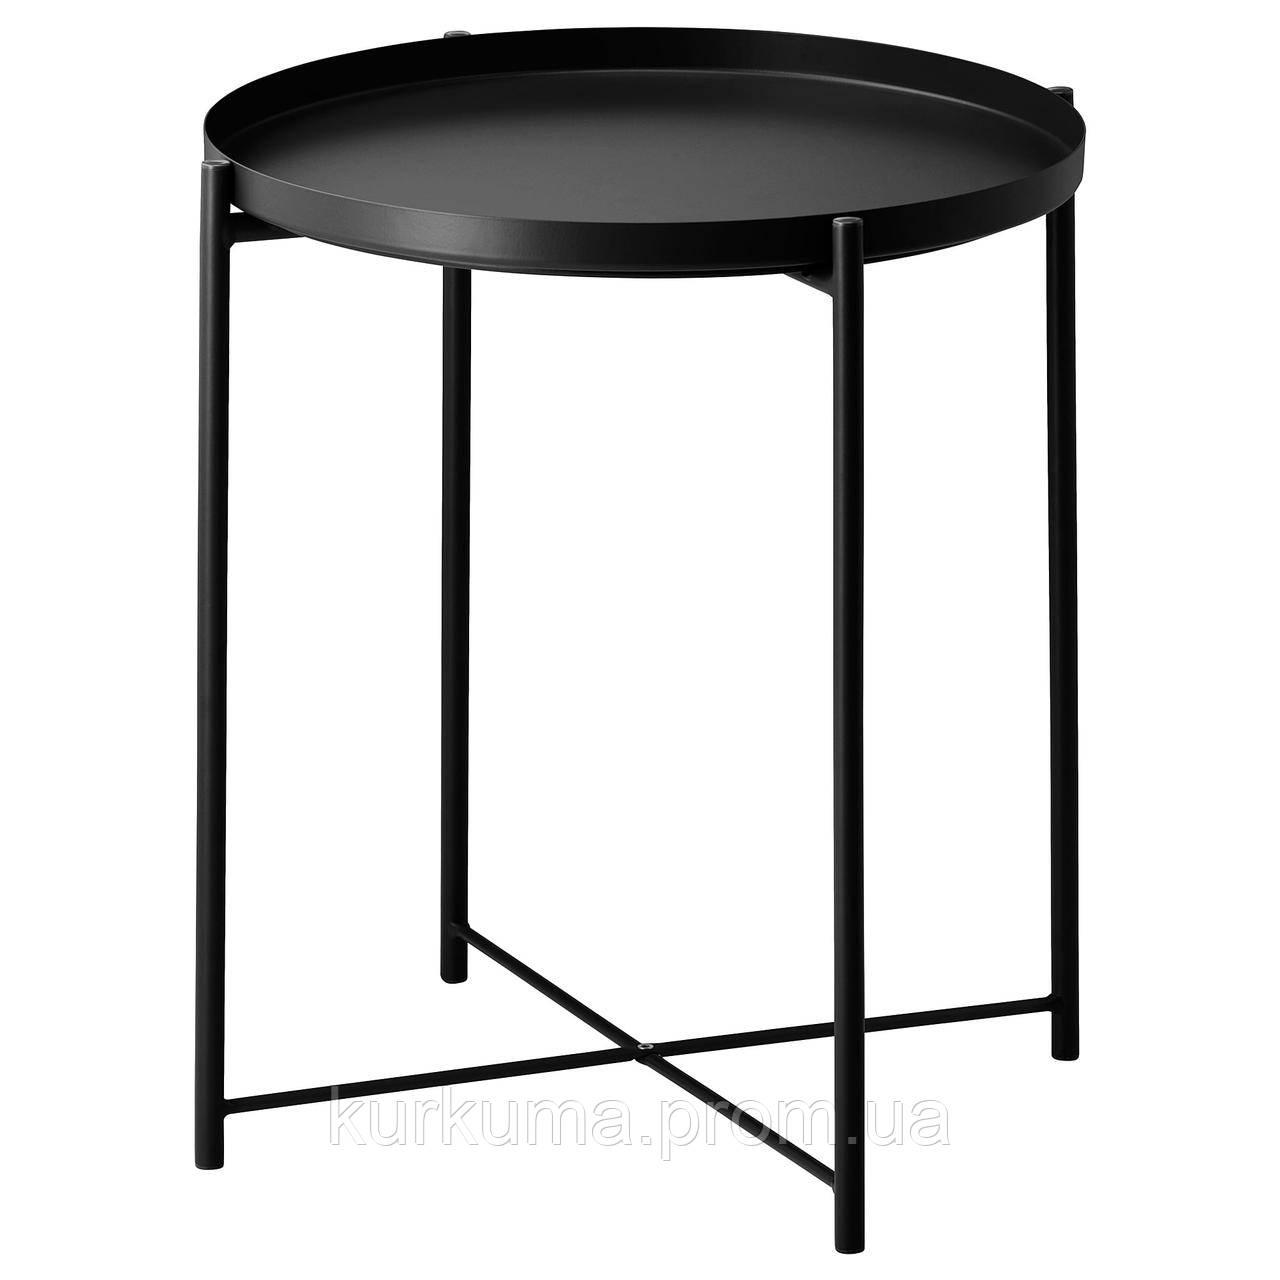 IKEA GLADOM Столик, черный  (504.119.90)